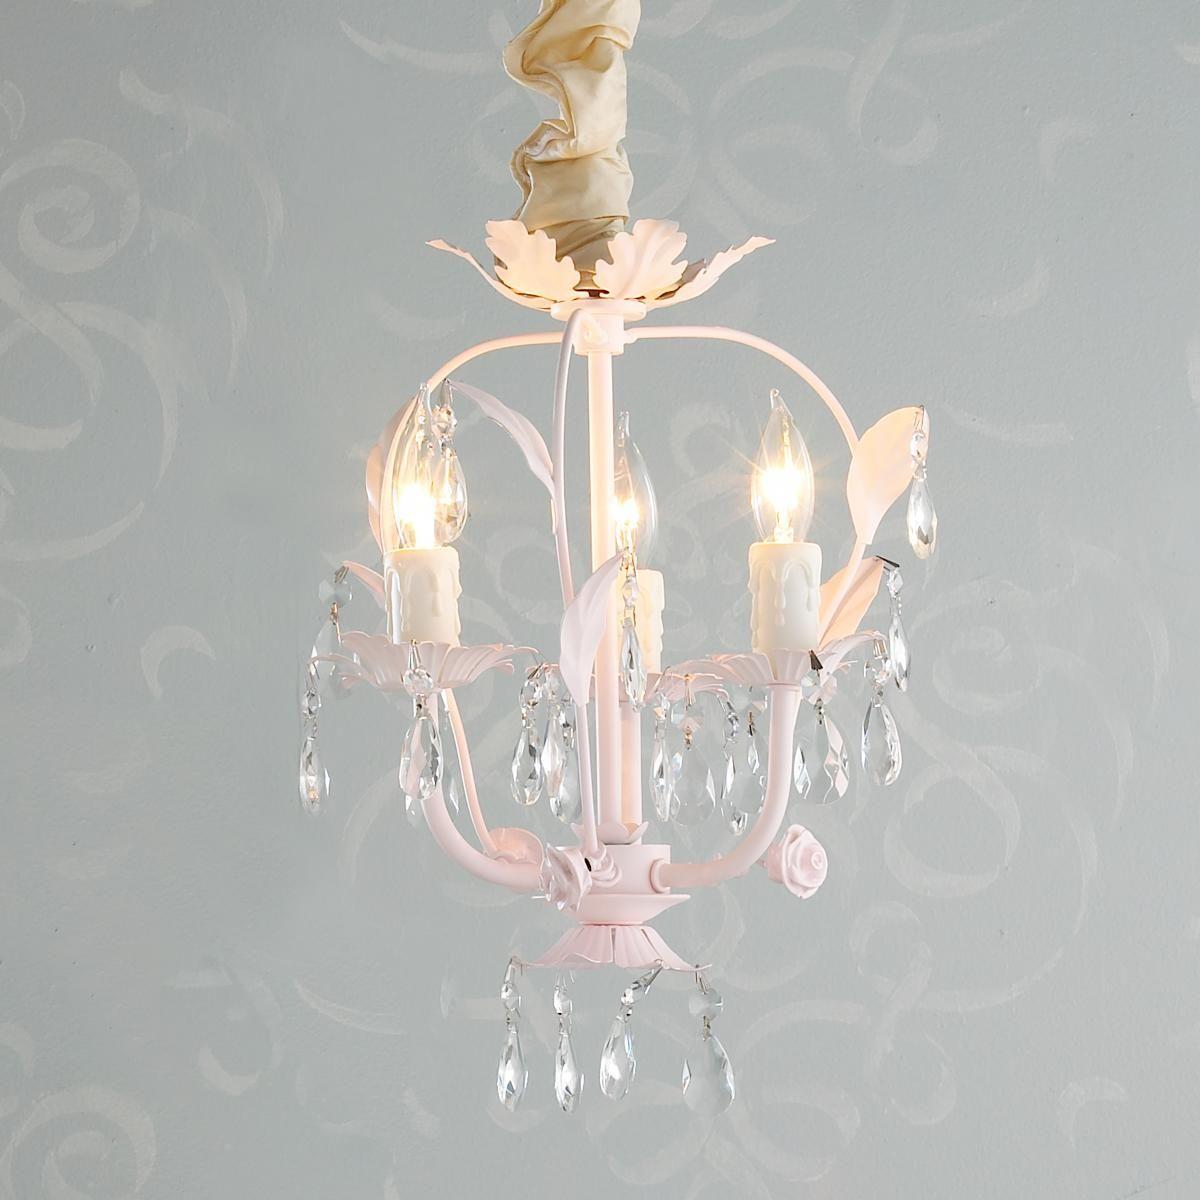 Framed crystal glam square ceiling light mini chandelier